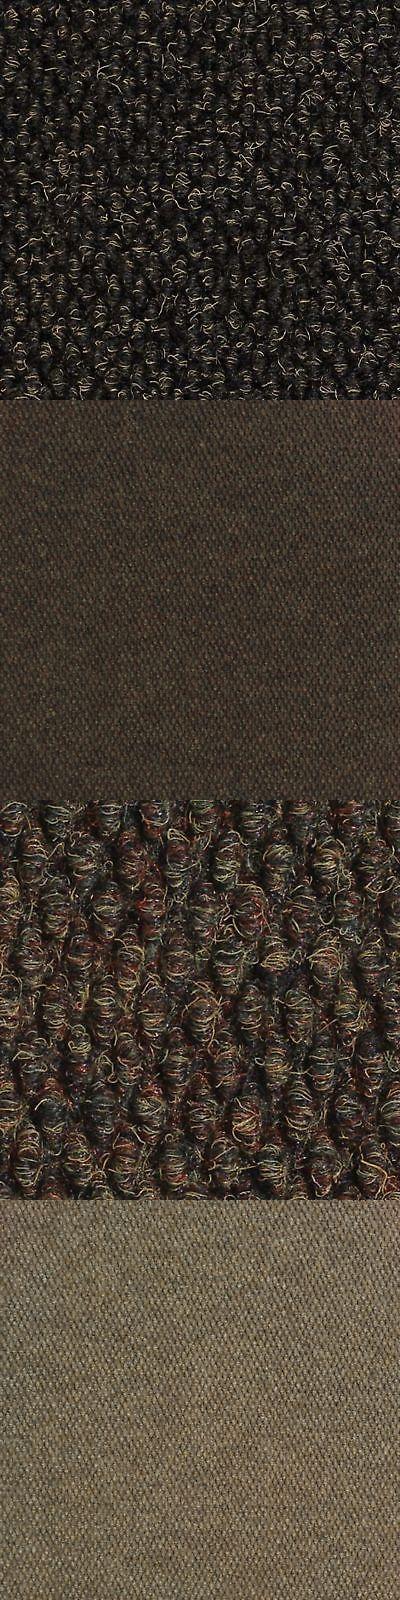 Wall To Wall Carpeting 175820 Mats Inc Super Nop Carpet Tile 19 7 X 19 7 12 Tiles Buy It Now Carpet Tiles Environmentally Friendly Flooring Wall Carpet